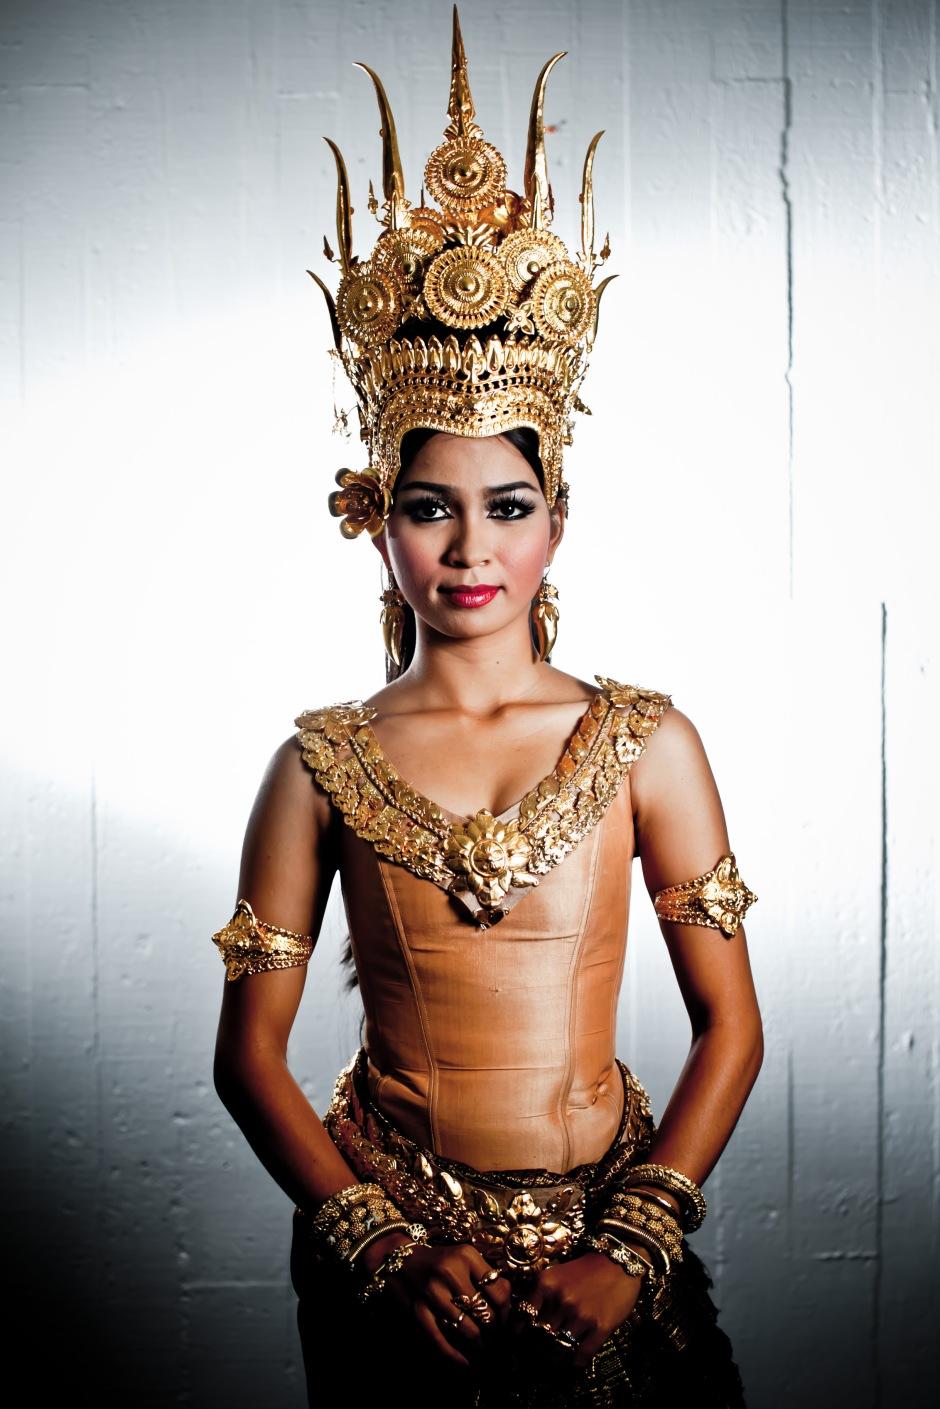 Chamroeuntola Chap of The Royal Ballet of Cambodia. Photo by Thomy Keat.